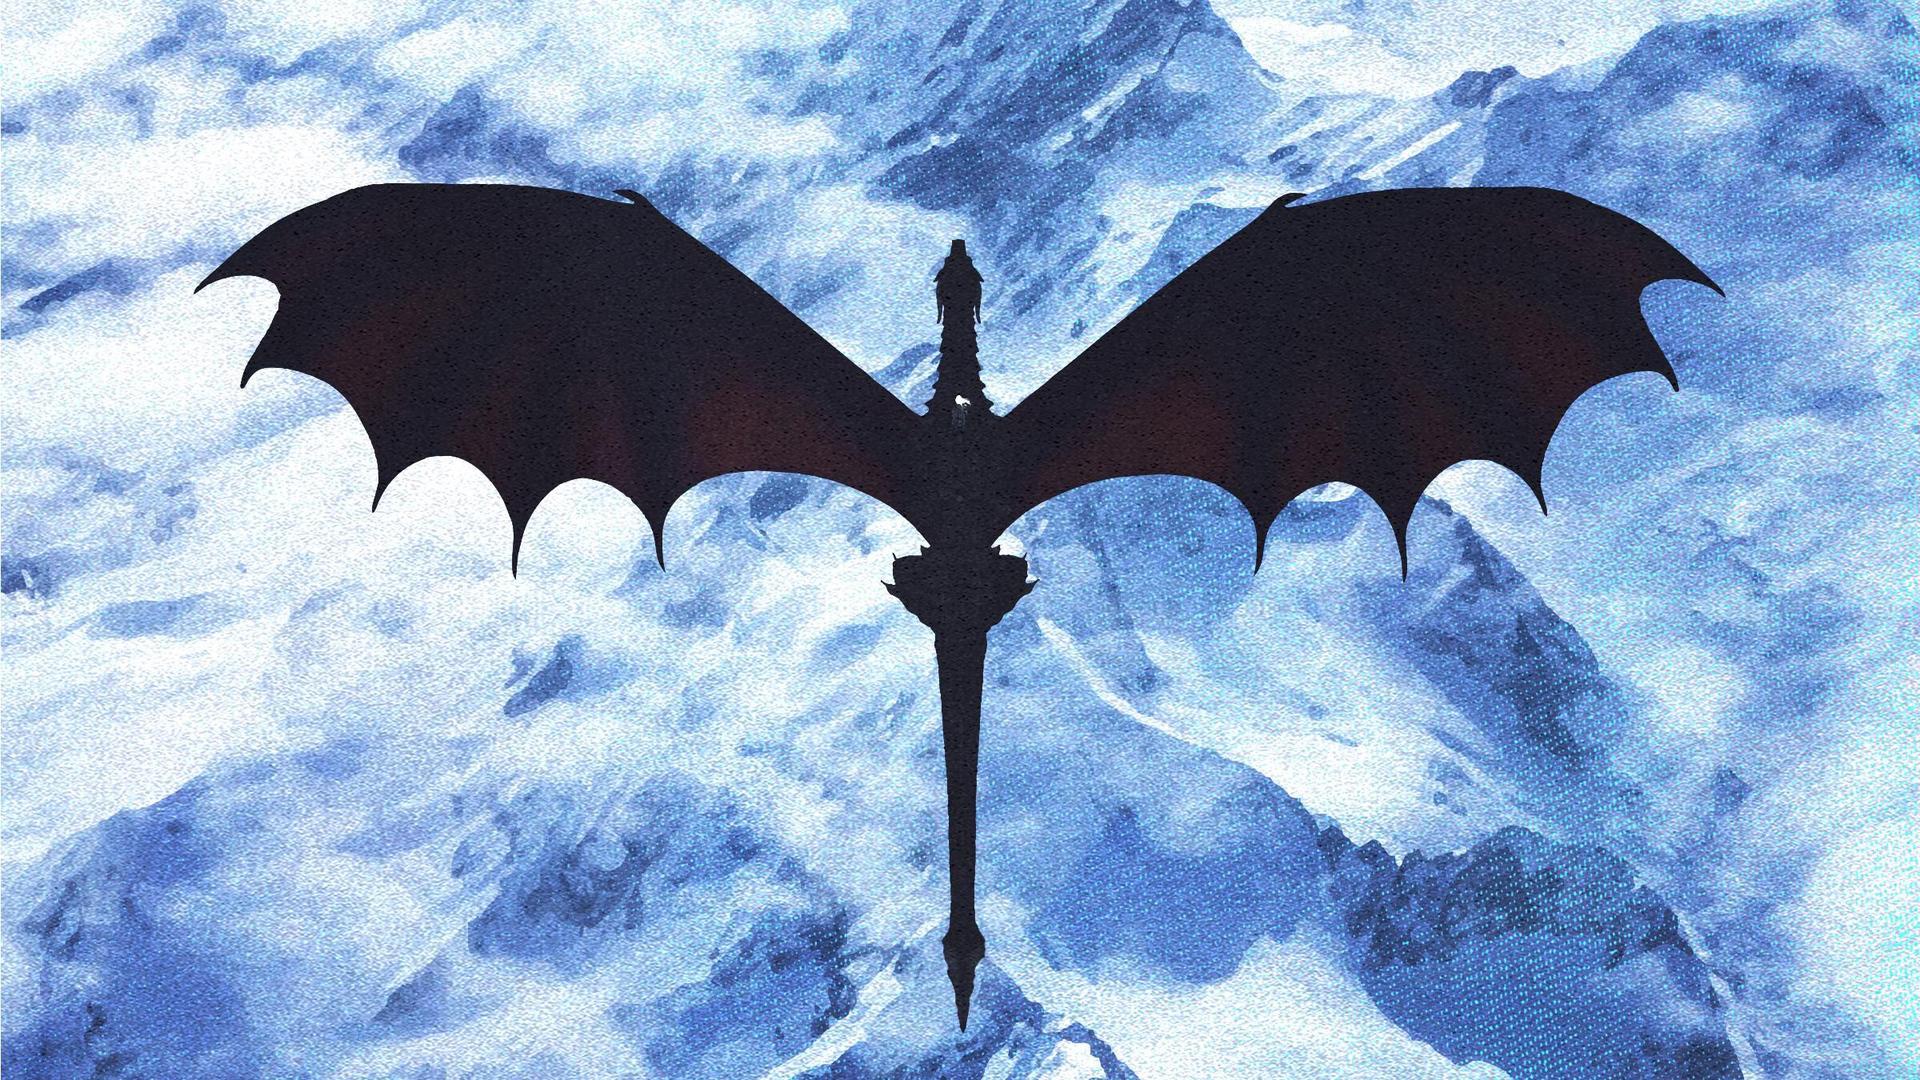 1920x1080 Game Of Thrones Dragon Artwork Laptop Full Hd 1080p Hd 4k